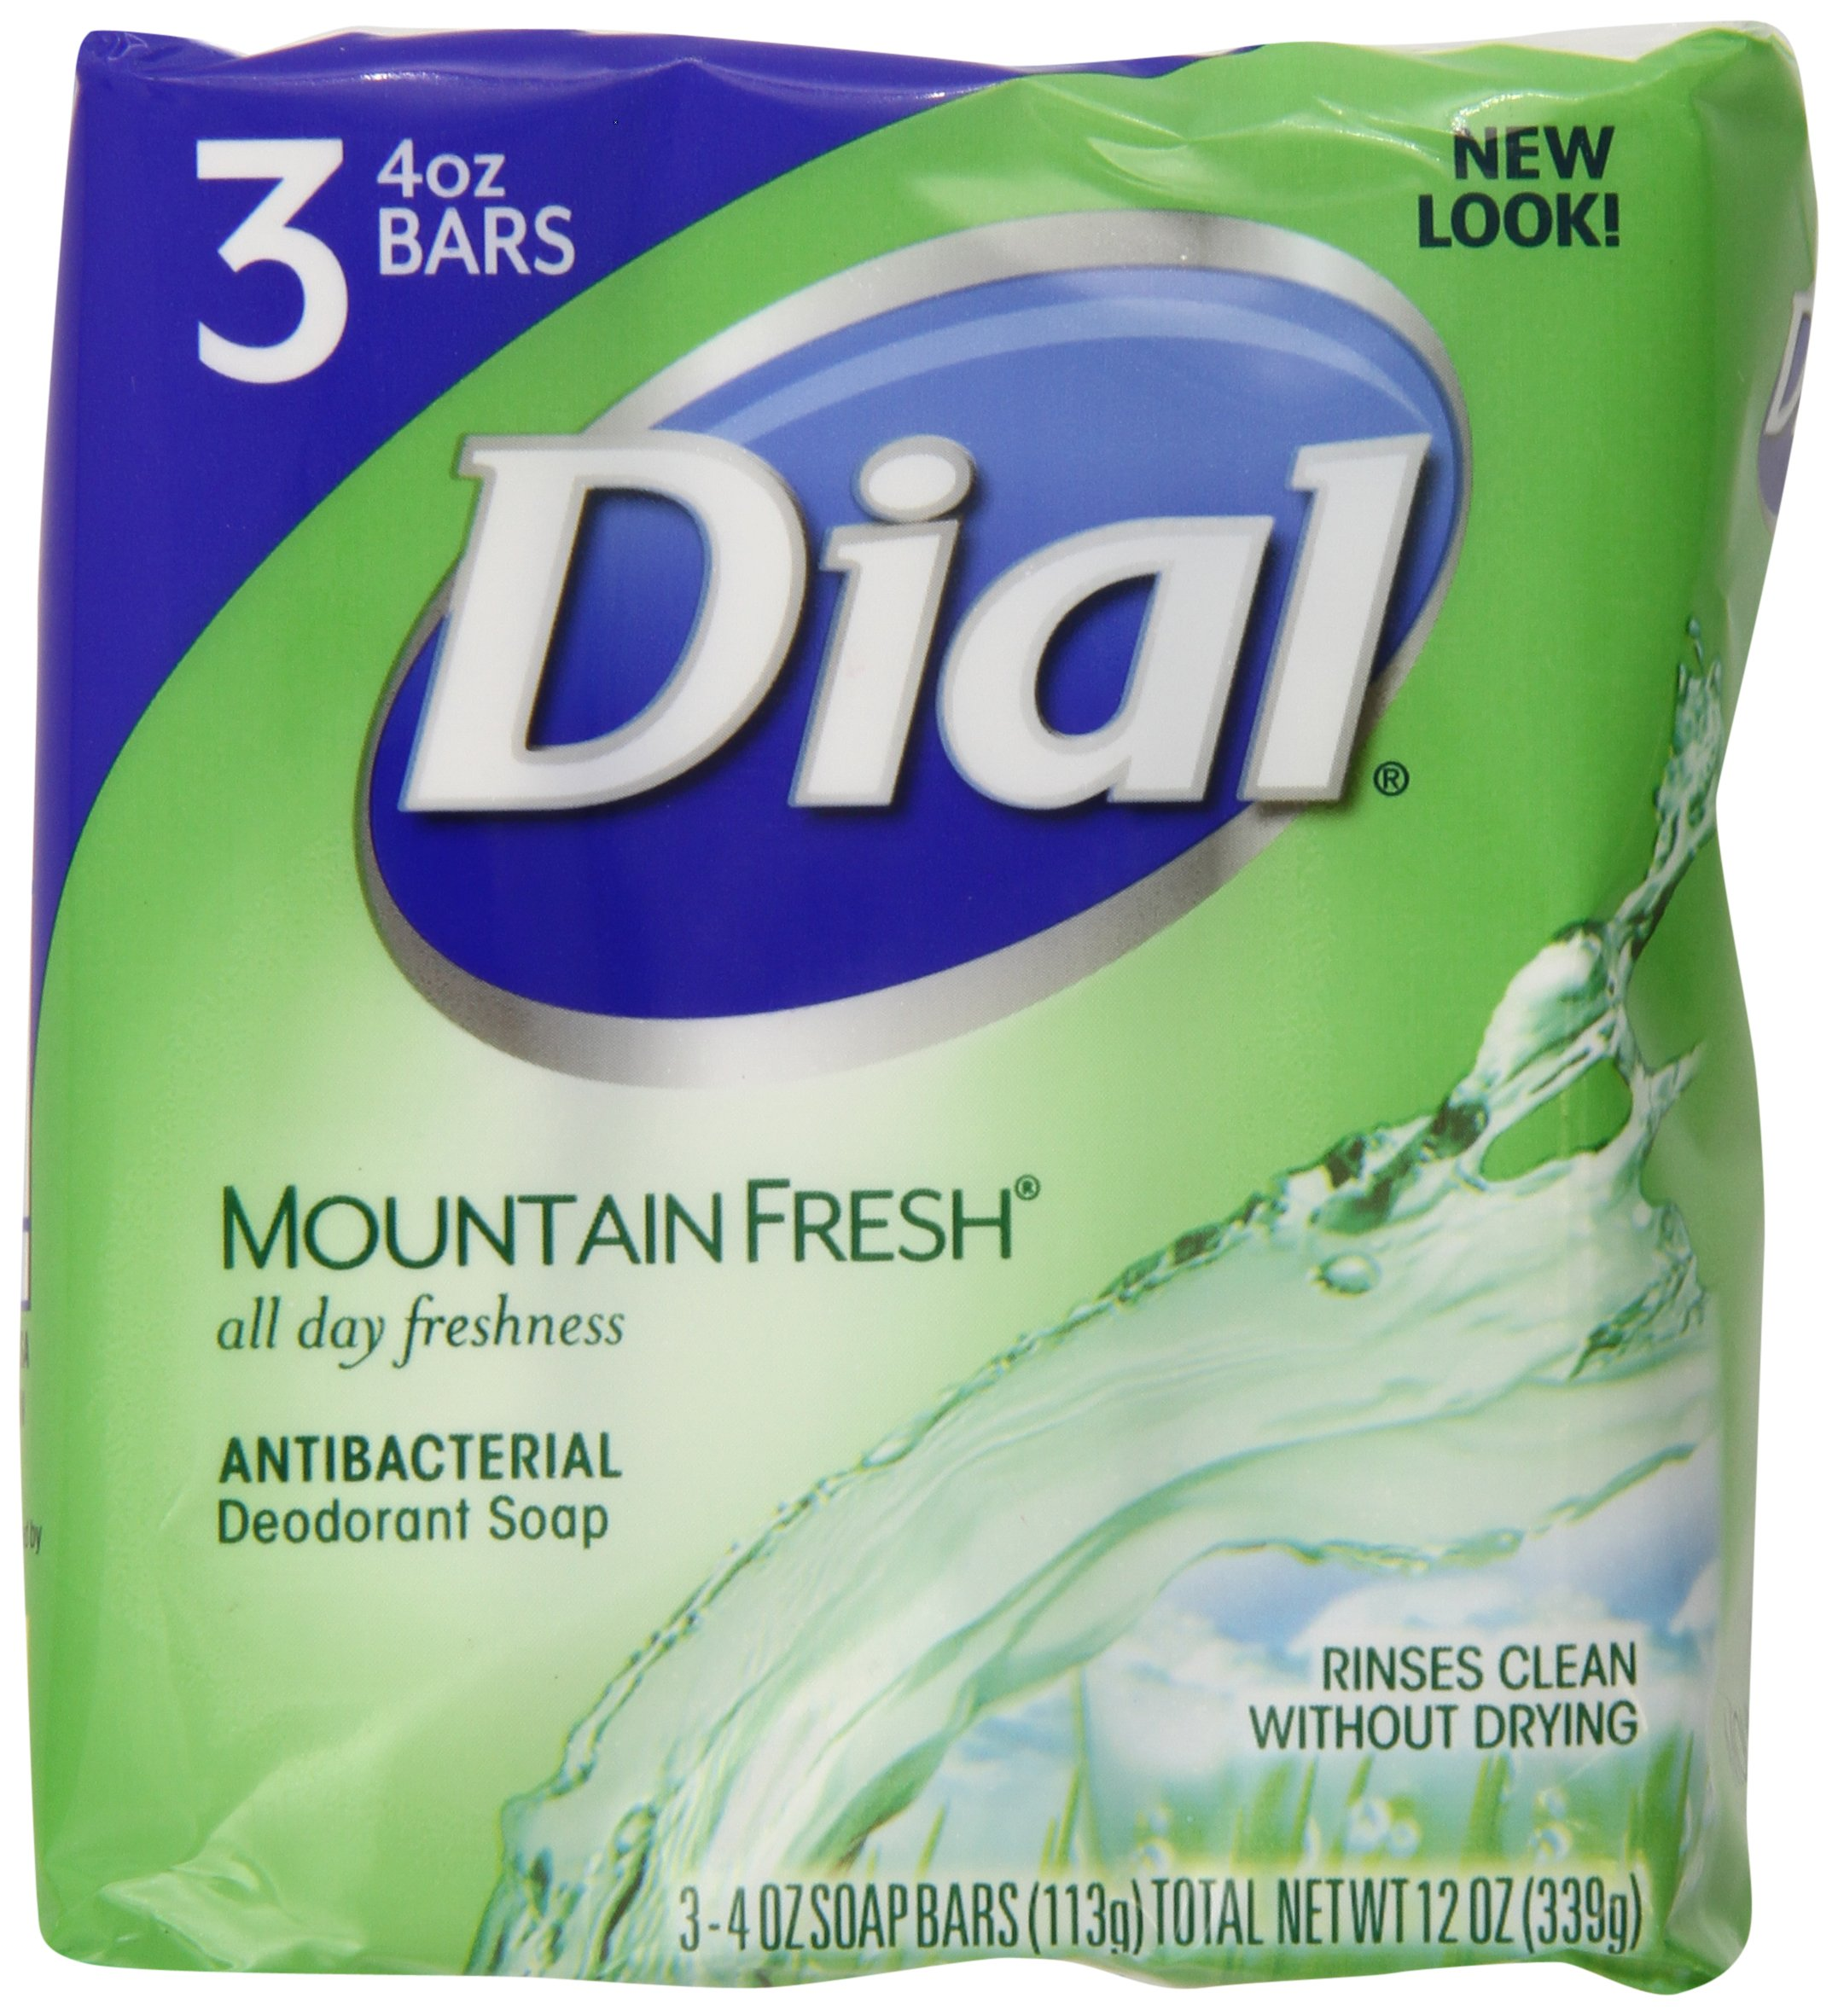 Dial Antibacterial Deodorant Soap, Mountain Fresh, 4 Ounce, 54 Bars